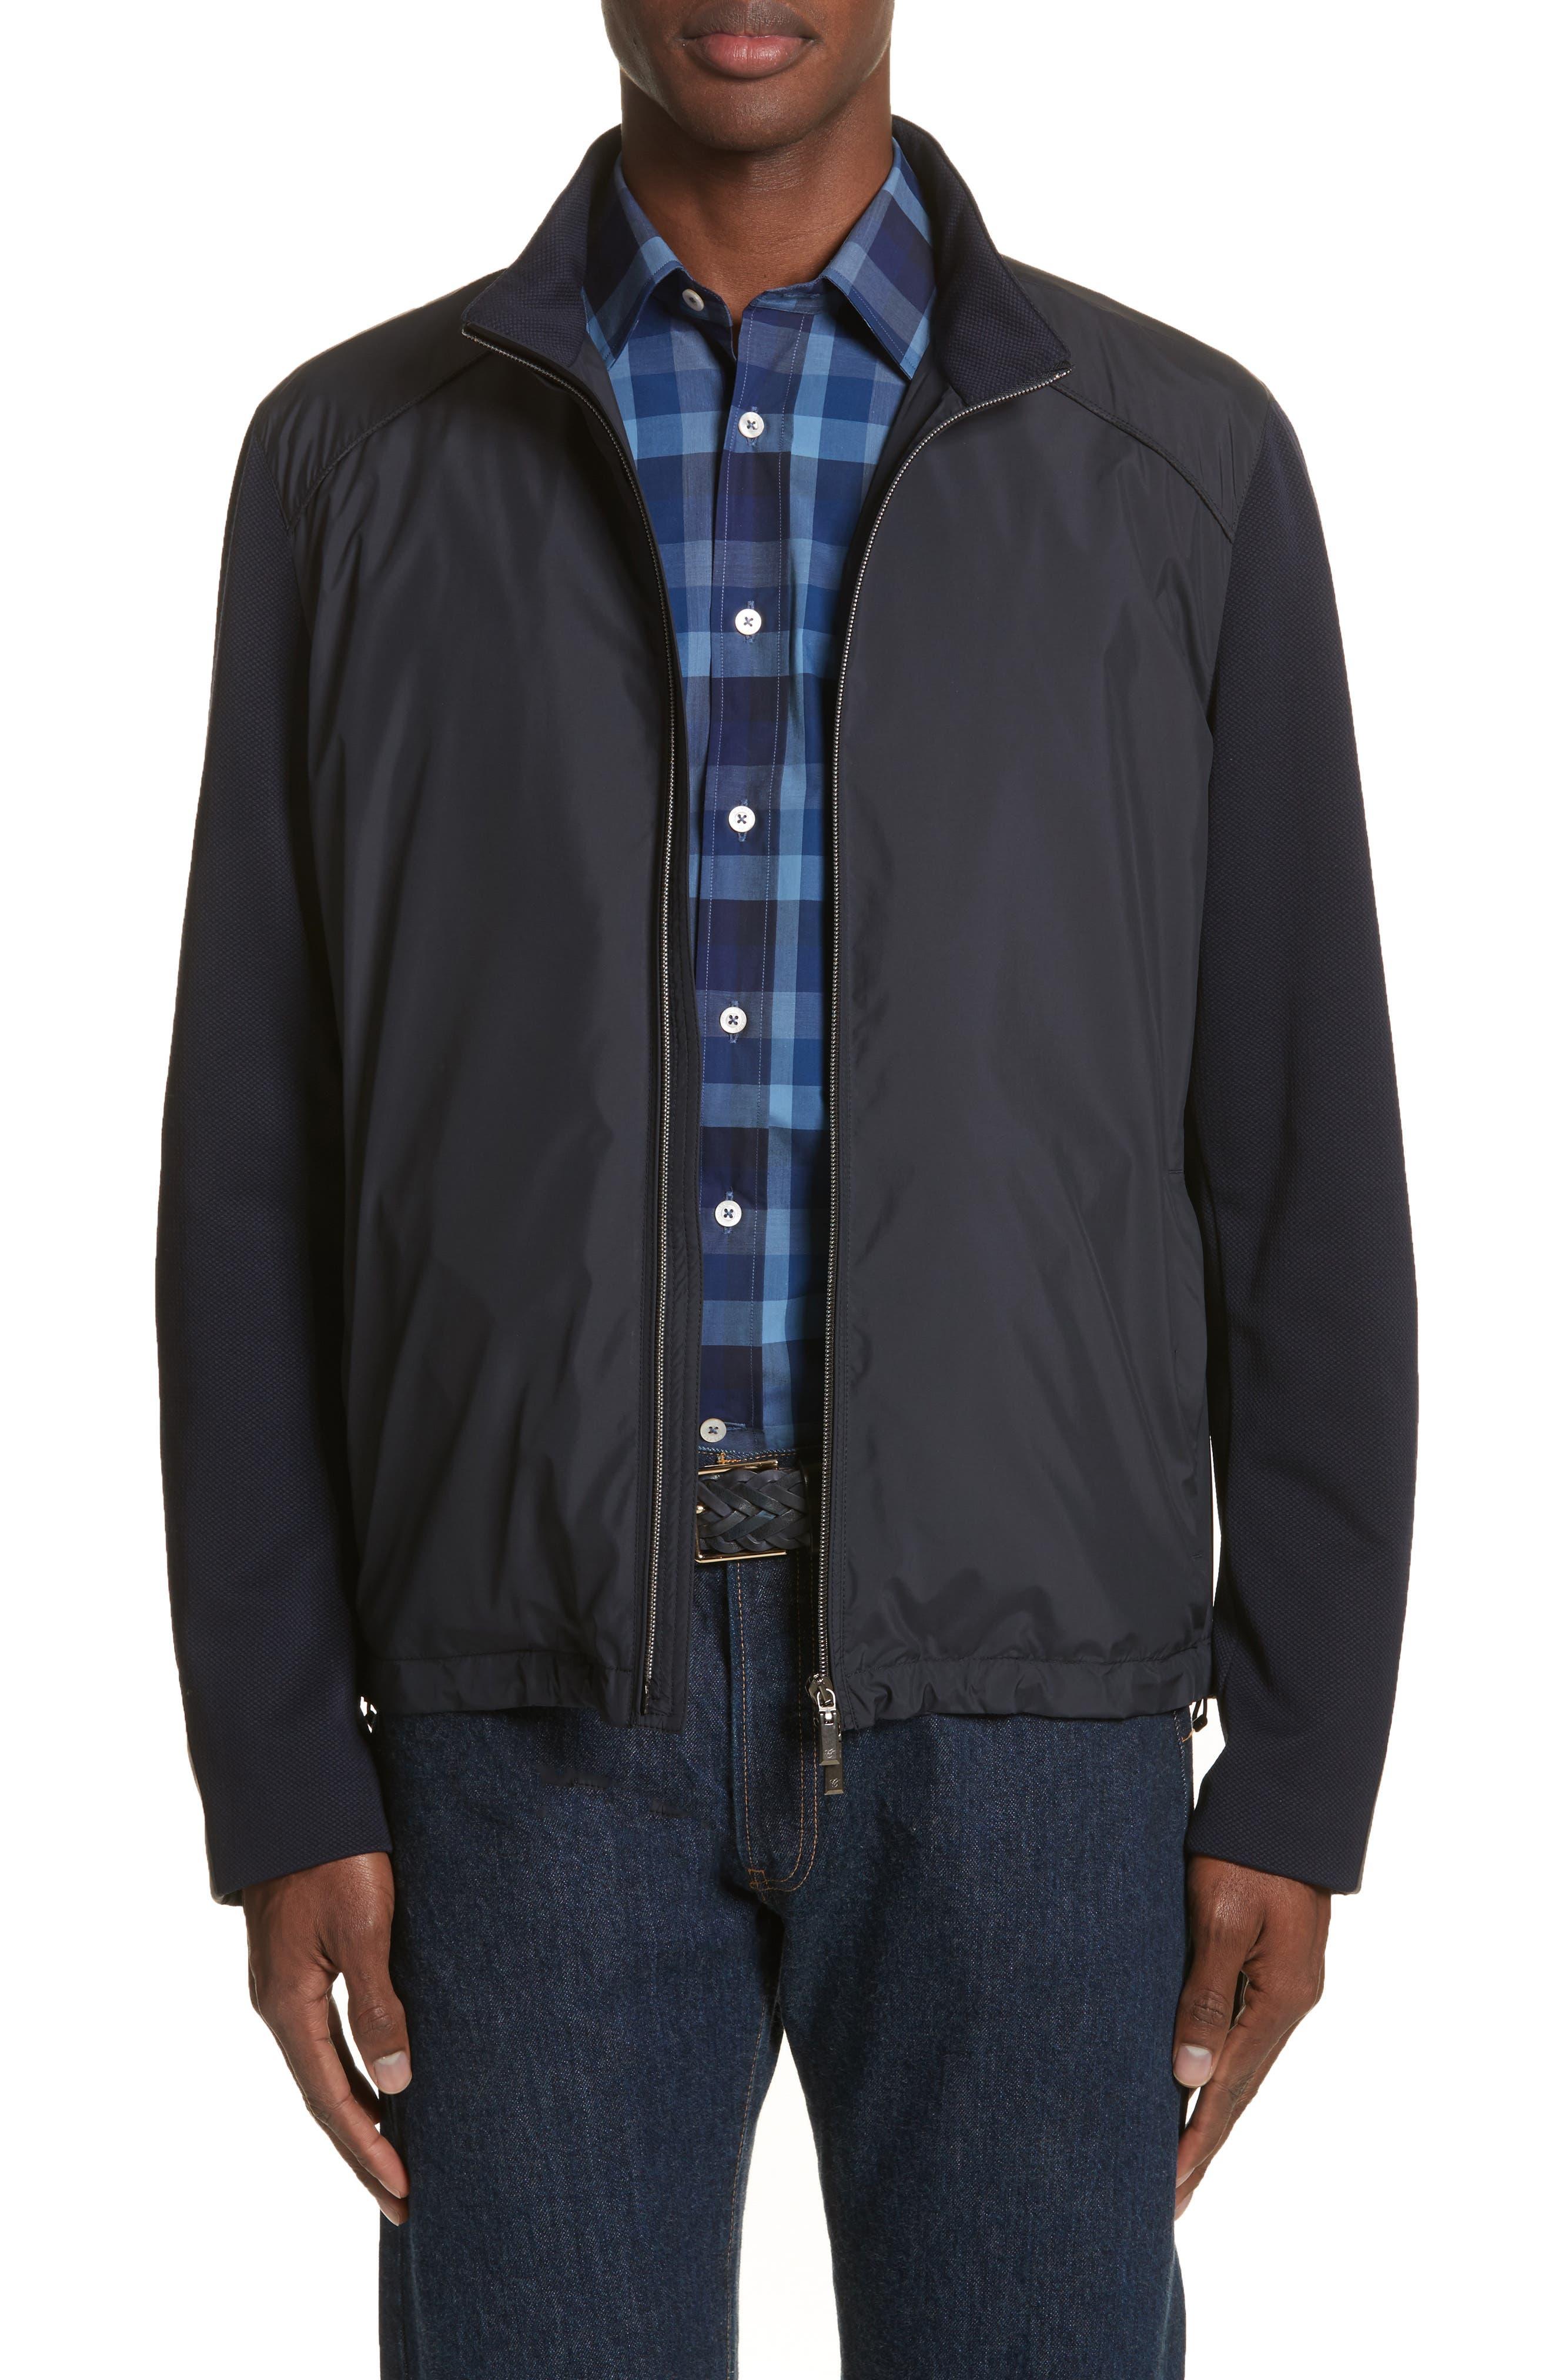 Main Image - Canali Water Repellent Microfiber Jacket